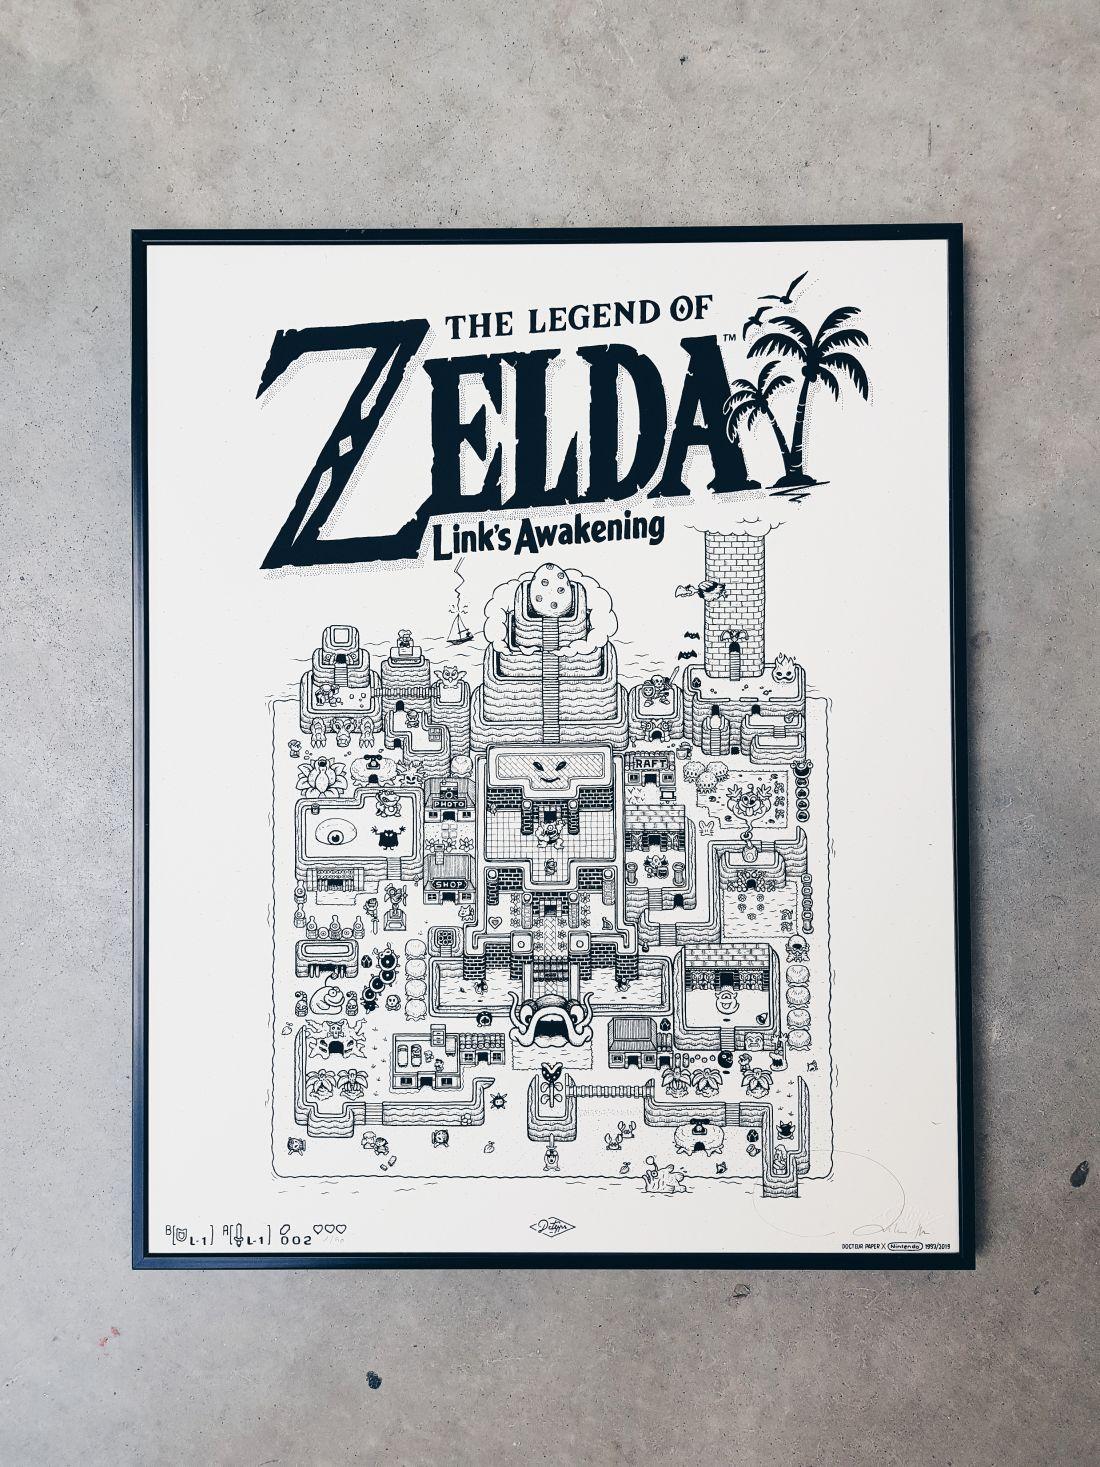 Zelda nintendo illustration Docteur Paper fnac ILLUSTRATION ILLUSTRATEUR